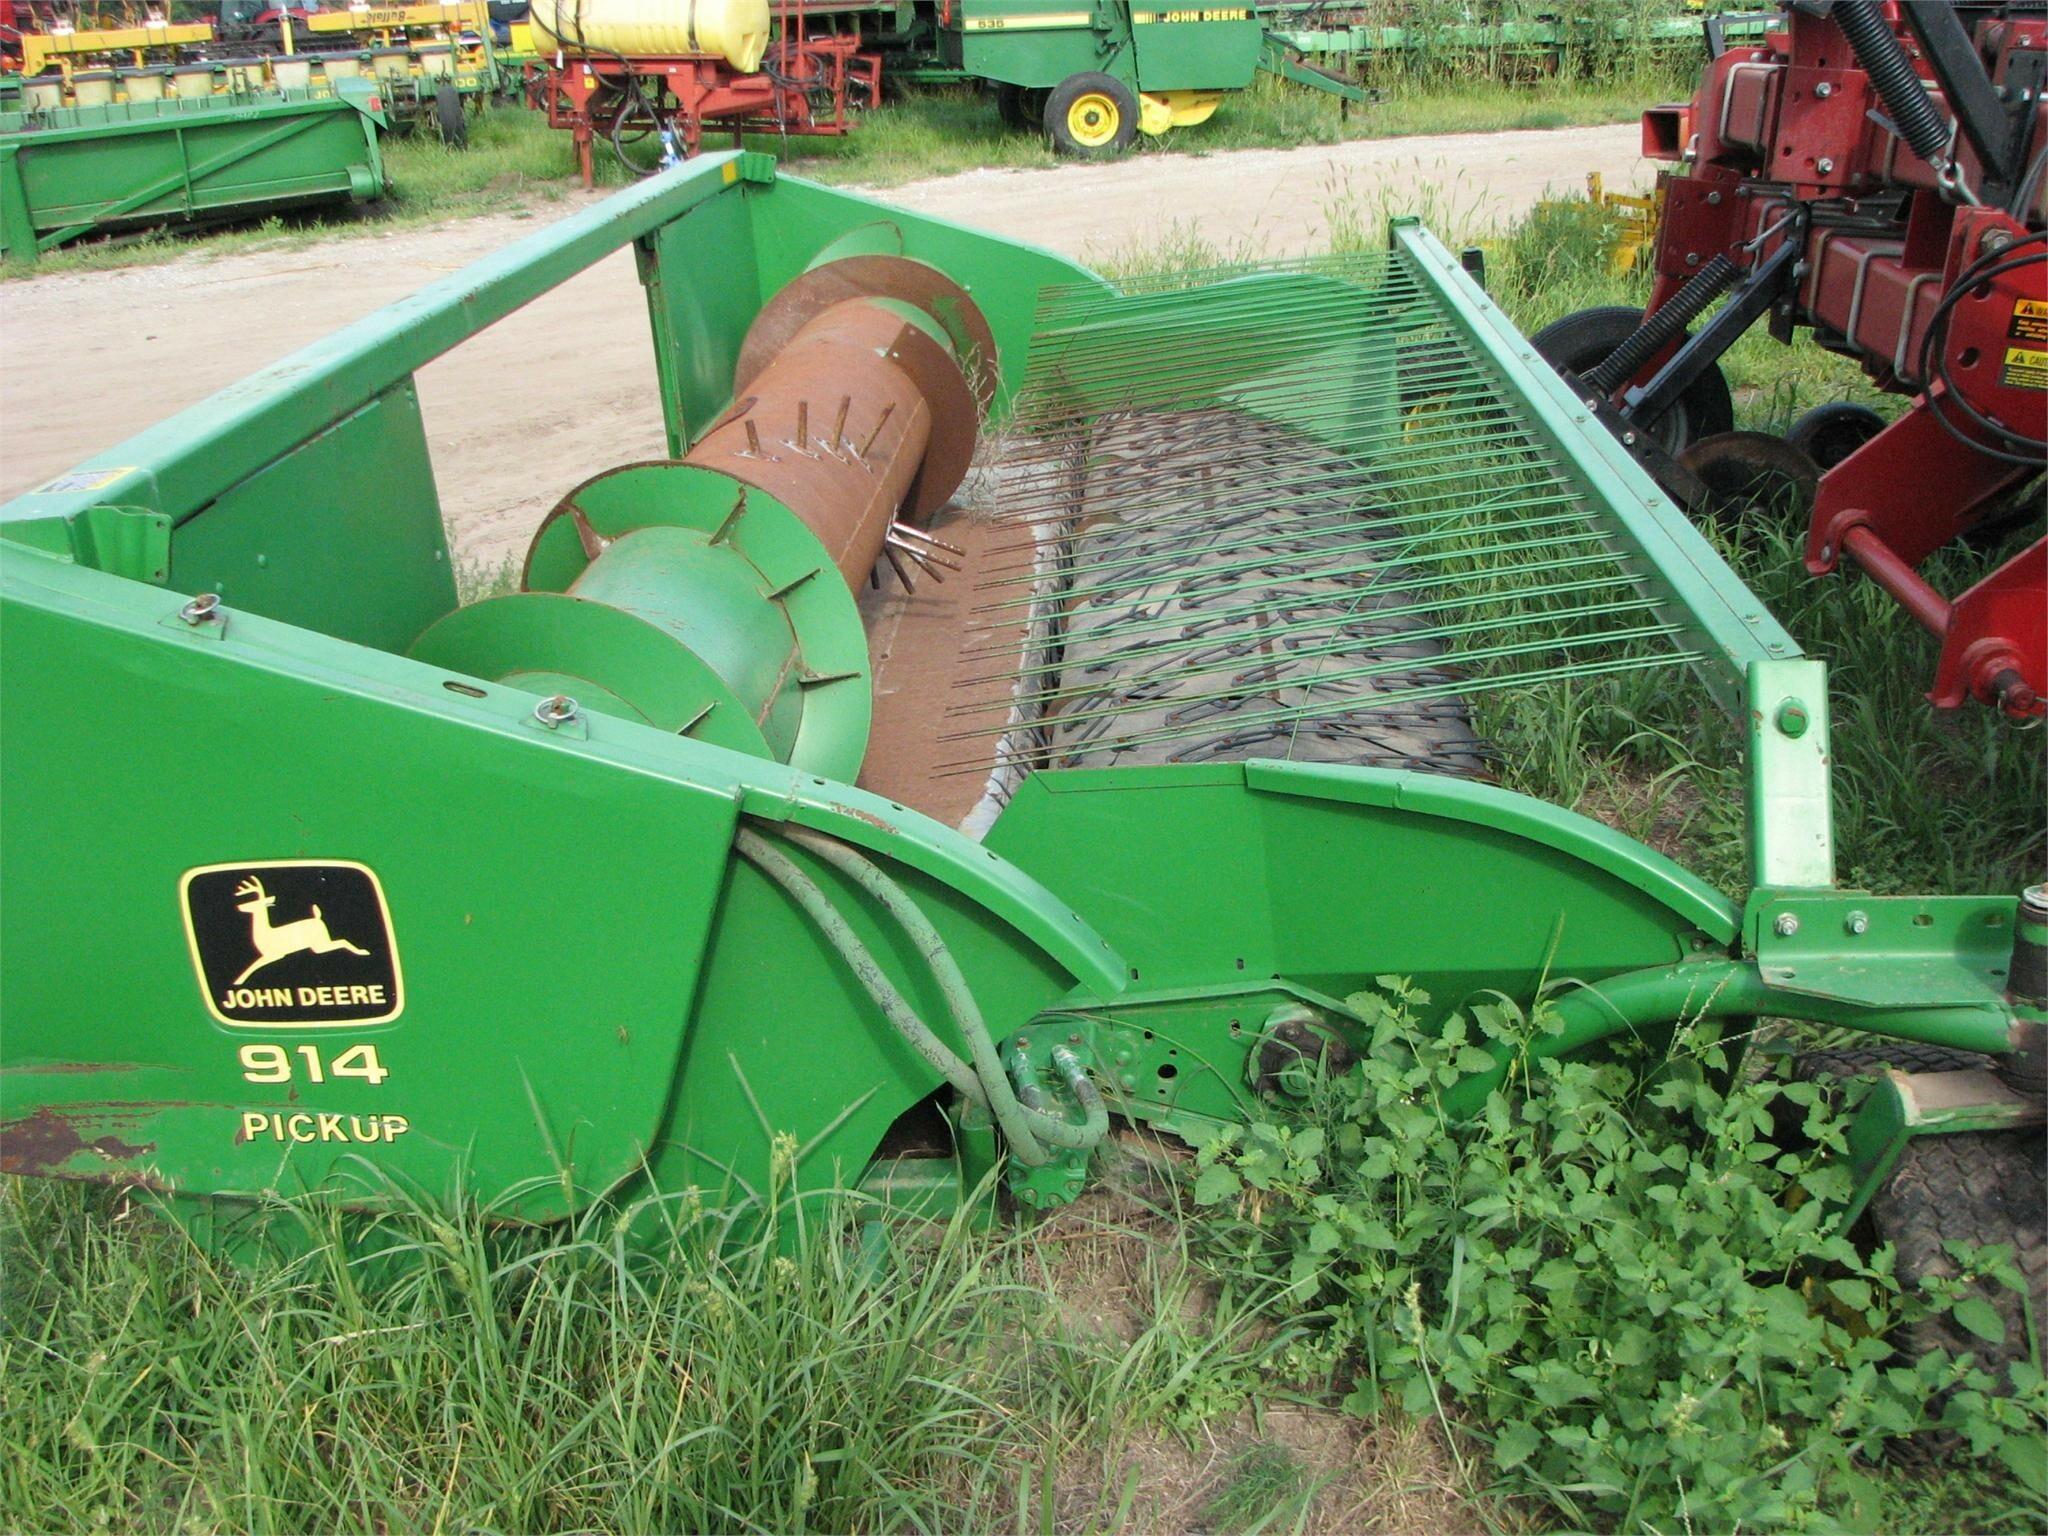 1996 John Deere 914 Forage Harvester Head